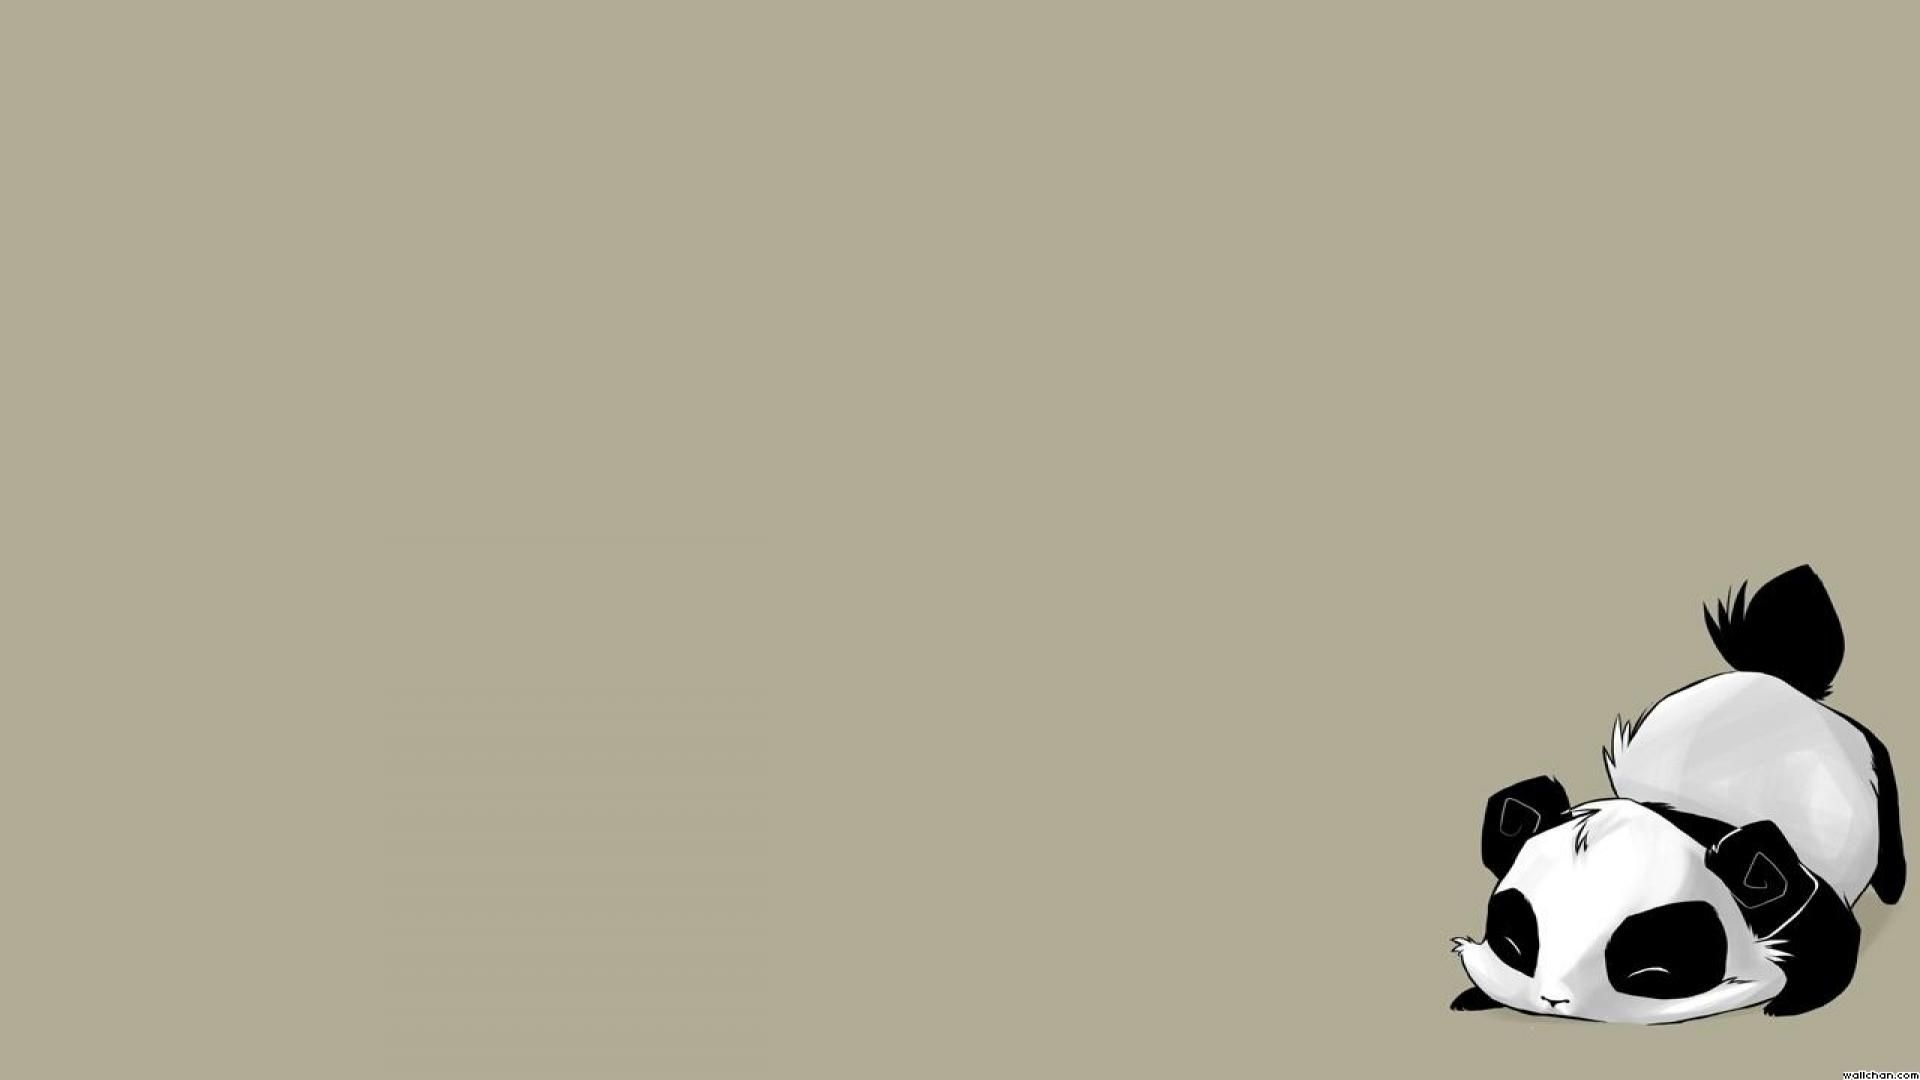 Cute Cartoon Animal Wallpapers Top Free Cute Cartoon Animal Backgrounds Wallpaperaccess